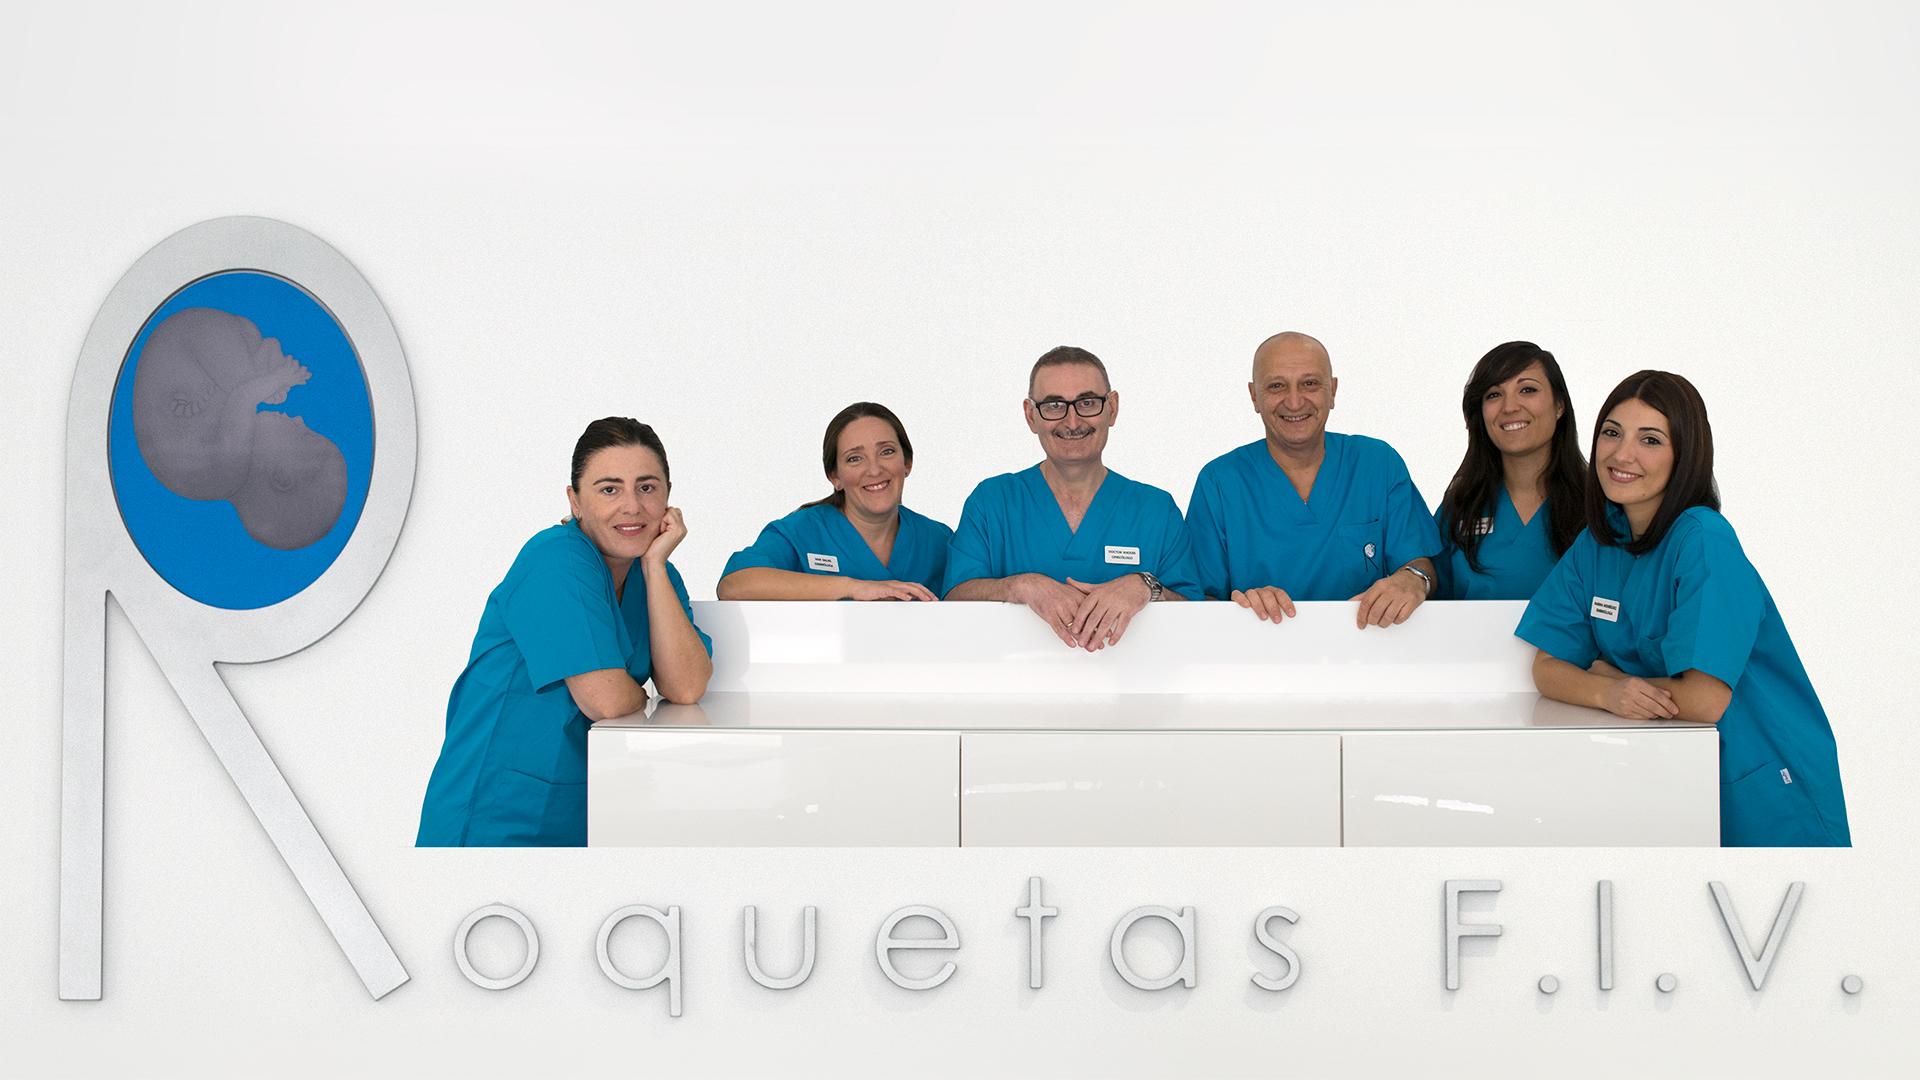 RoquetasFIV